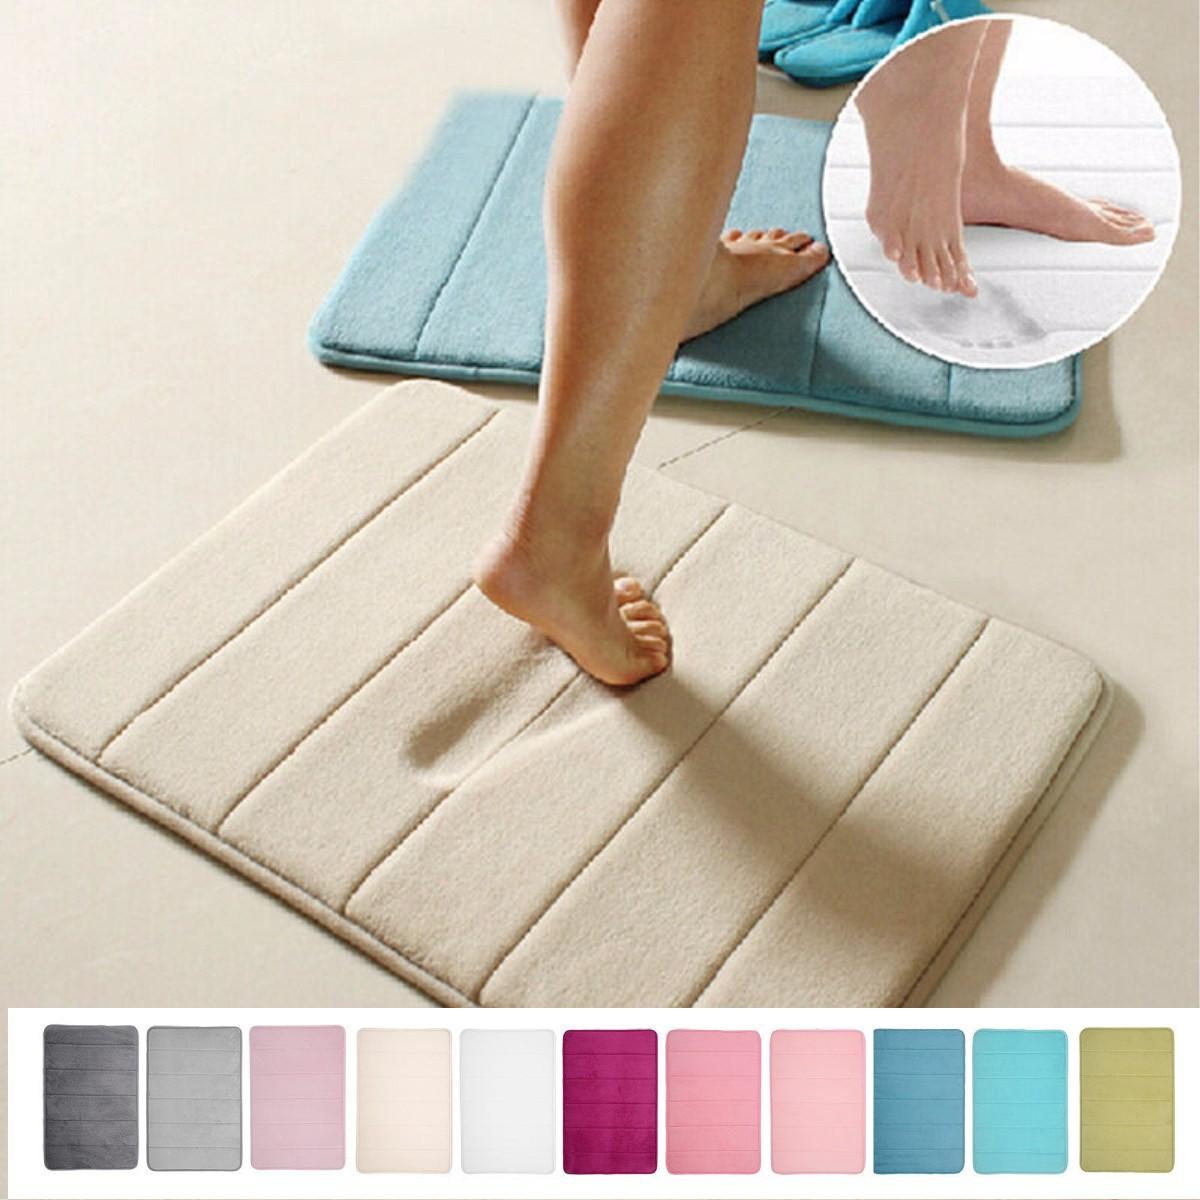 Soft and Comfortable Memory Foam Mat Bath Bathroom Bedroom Kitchen Dorm Floor Shower Rug Non-slip